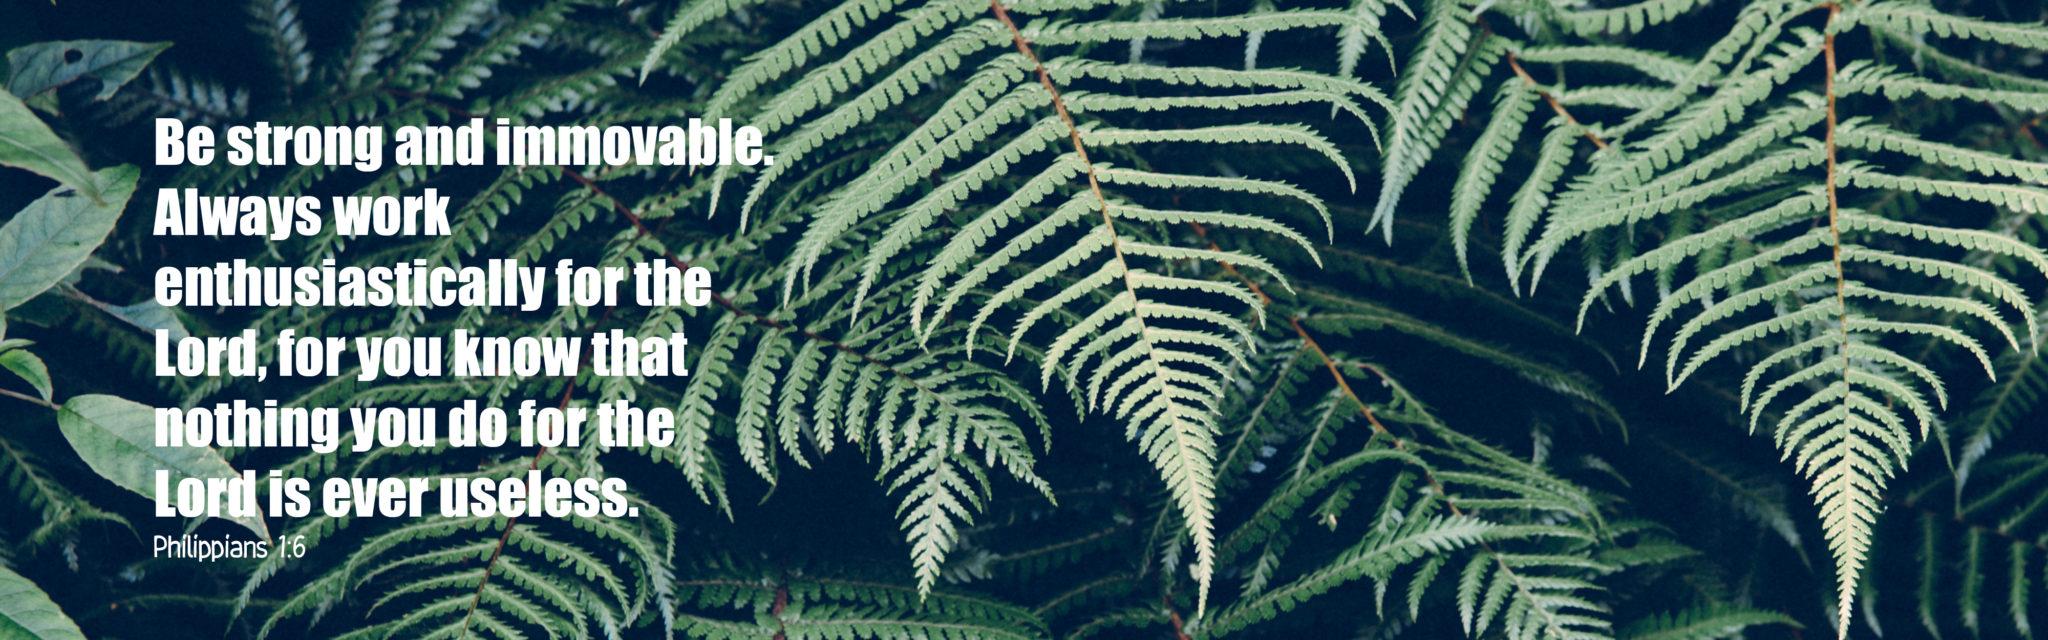 NZ-bibleslide-Philippians-1.6